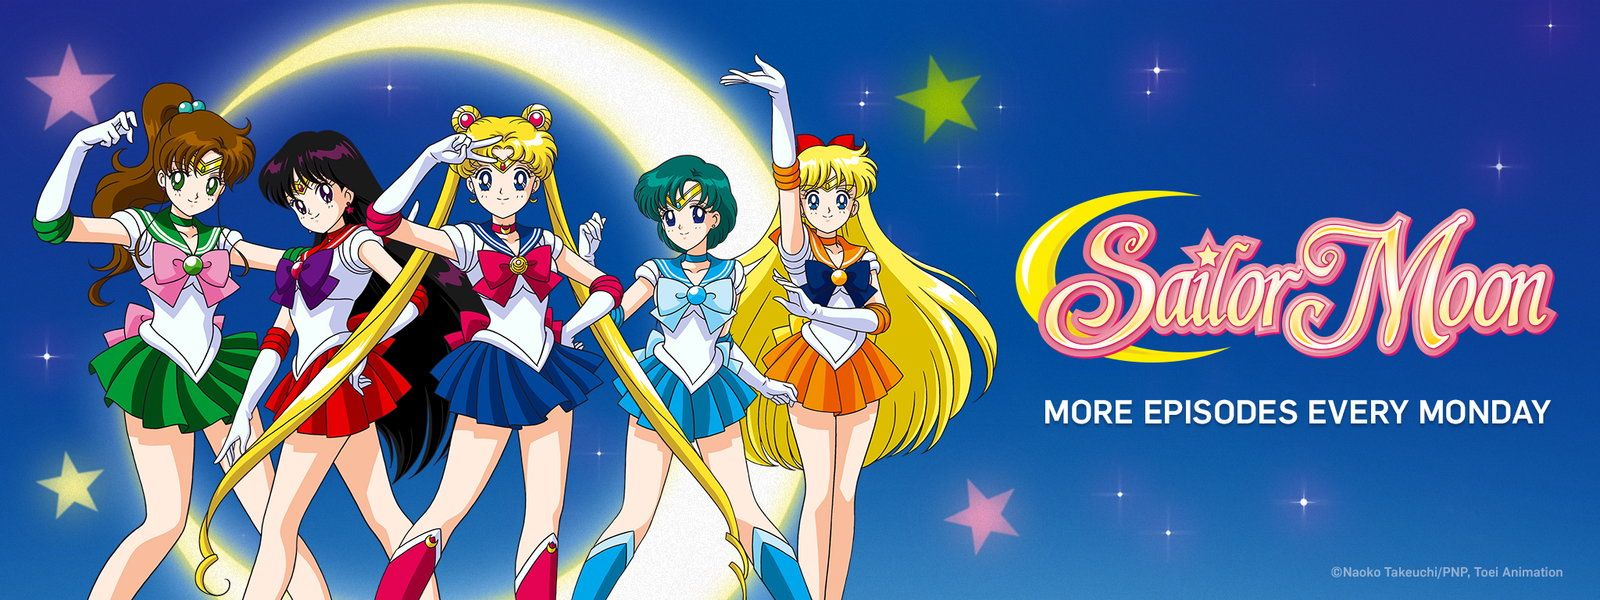 Sailor Moon NEON VALLEY Streaming Anime